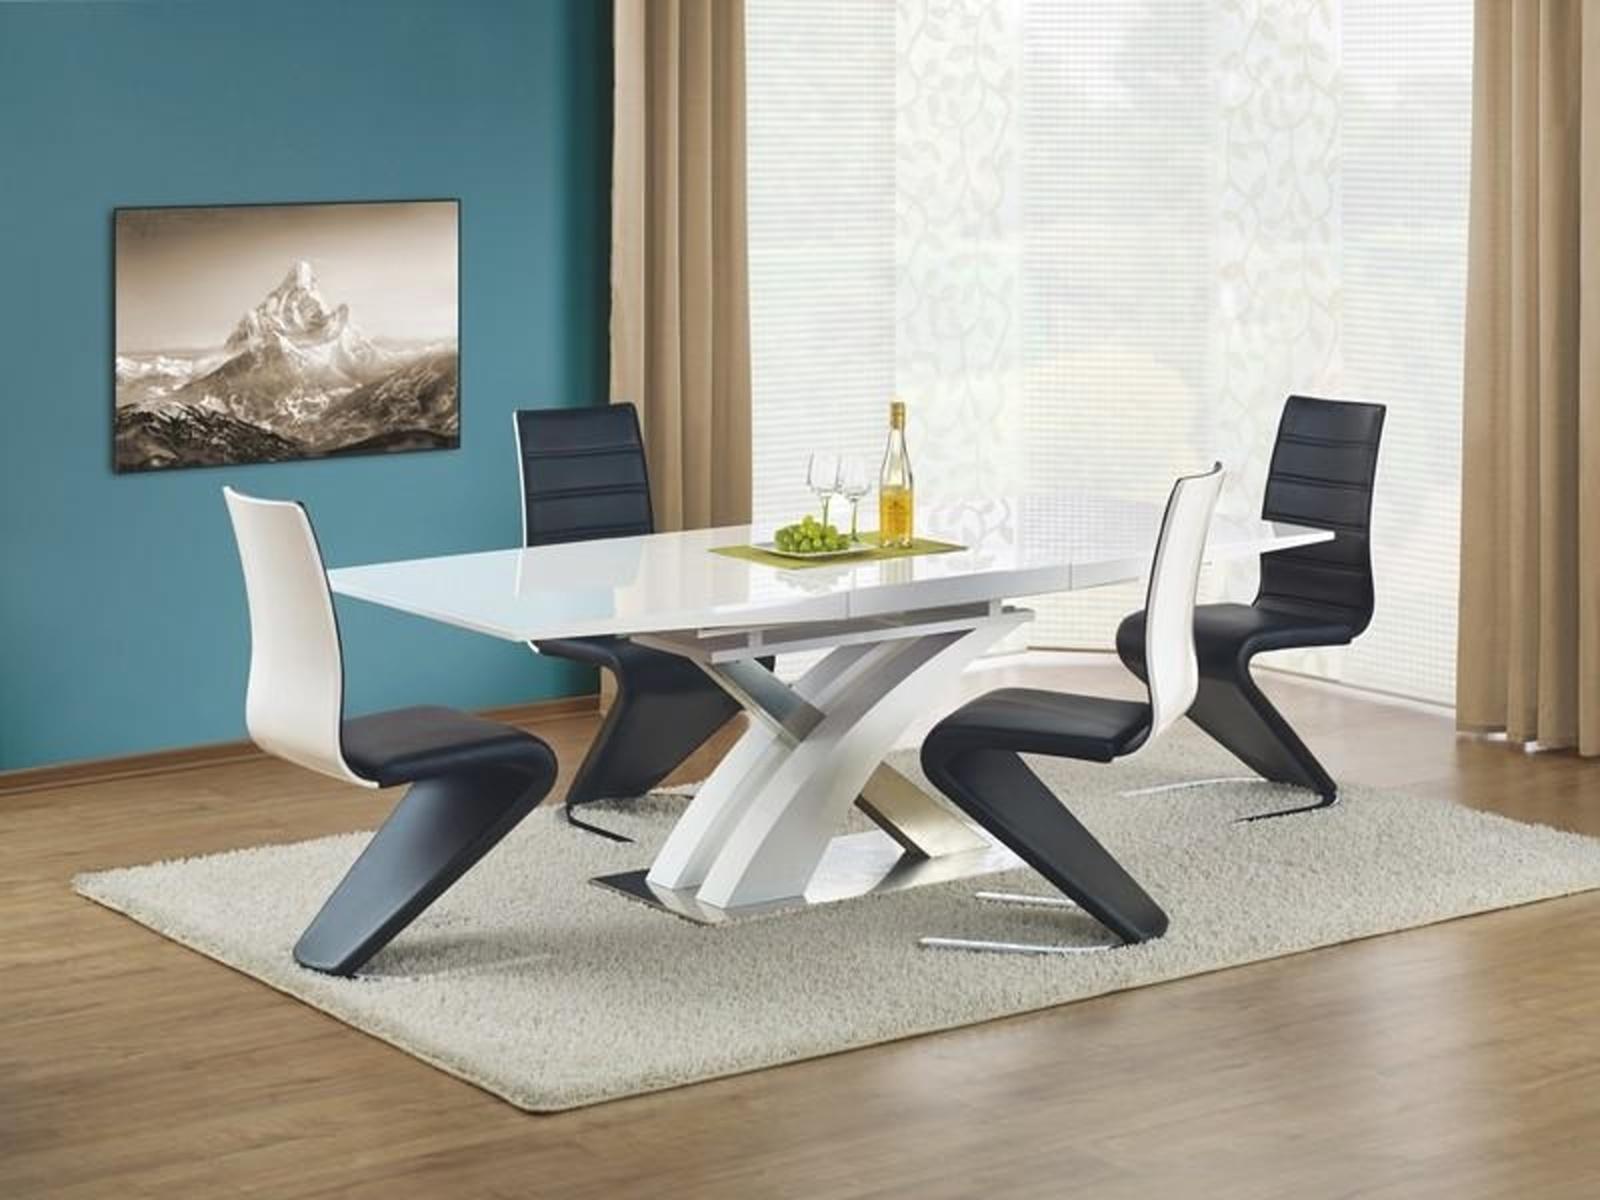 Halmar Jídelní stůl rozkládací SANDOR, bílý lak